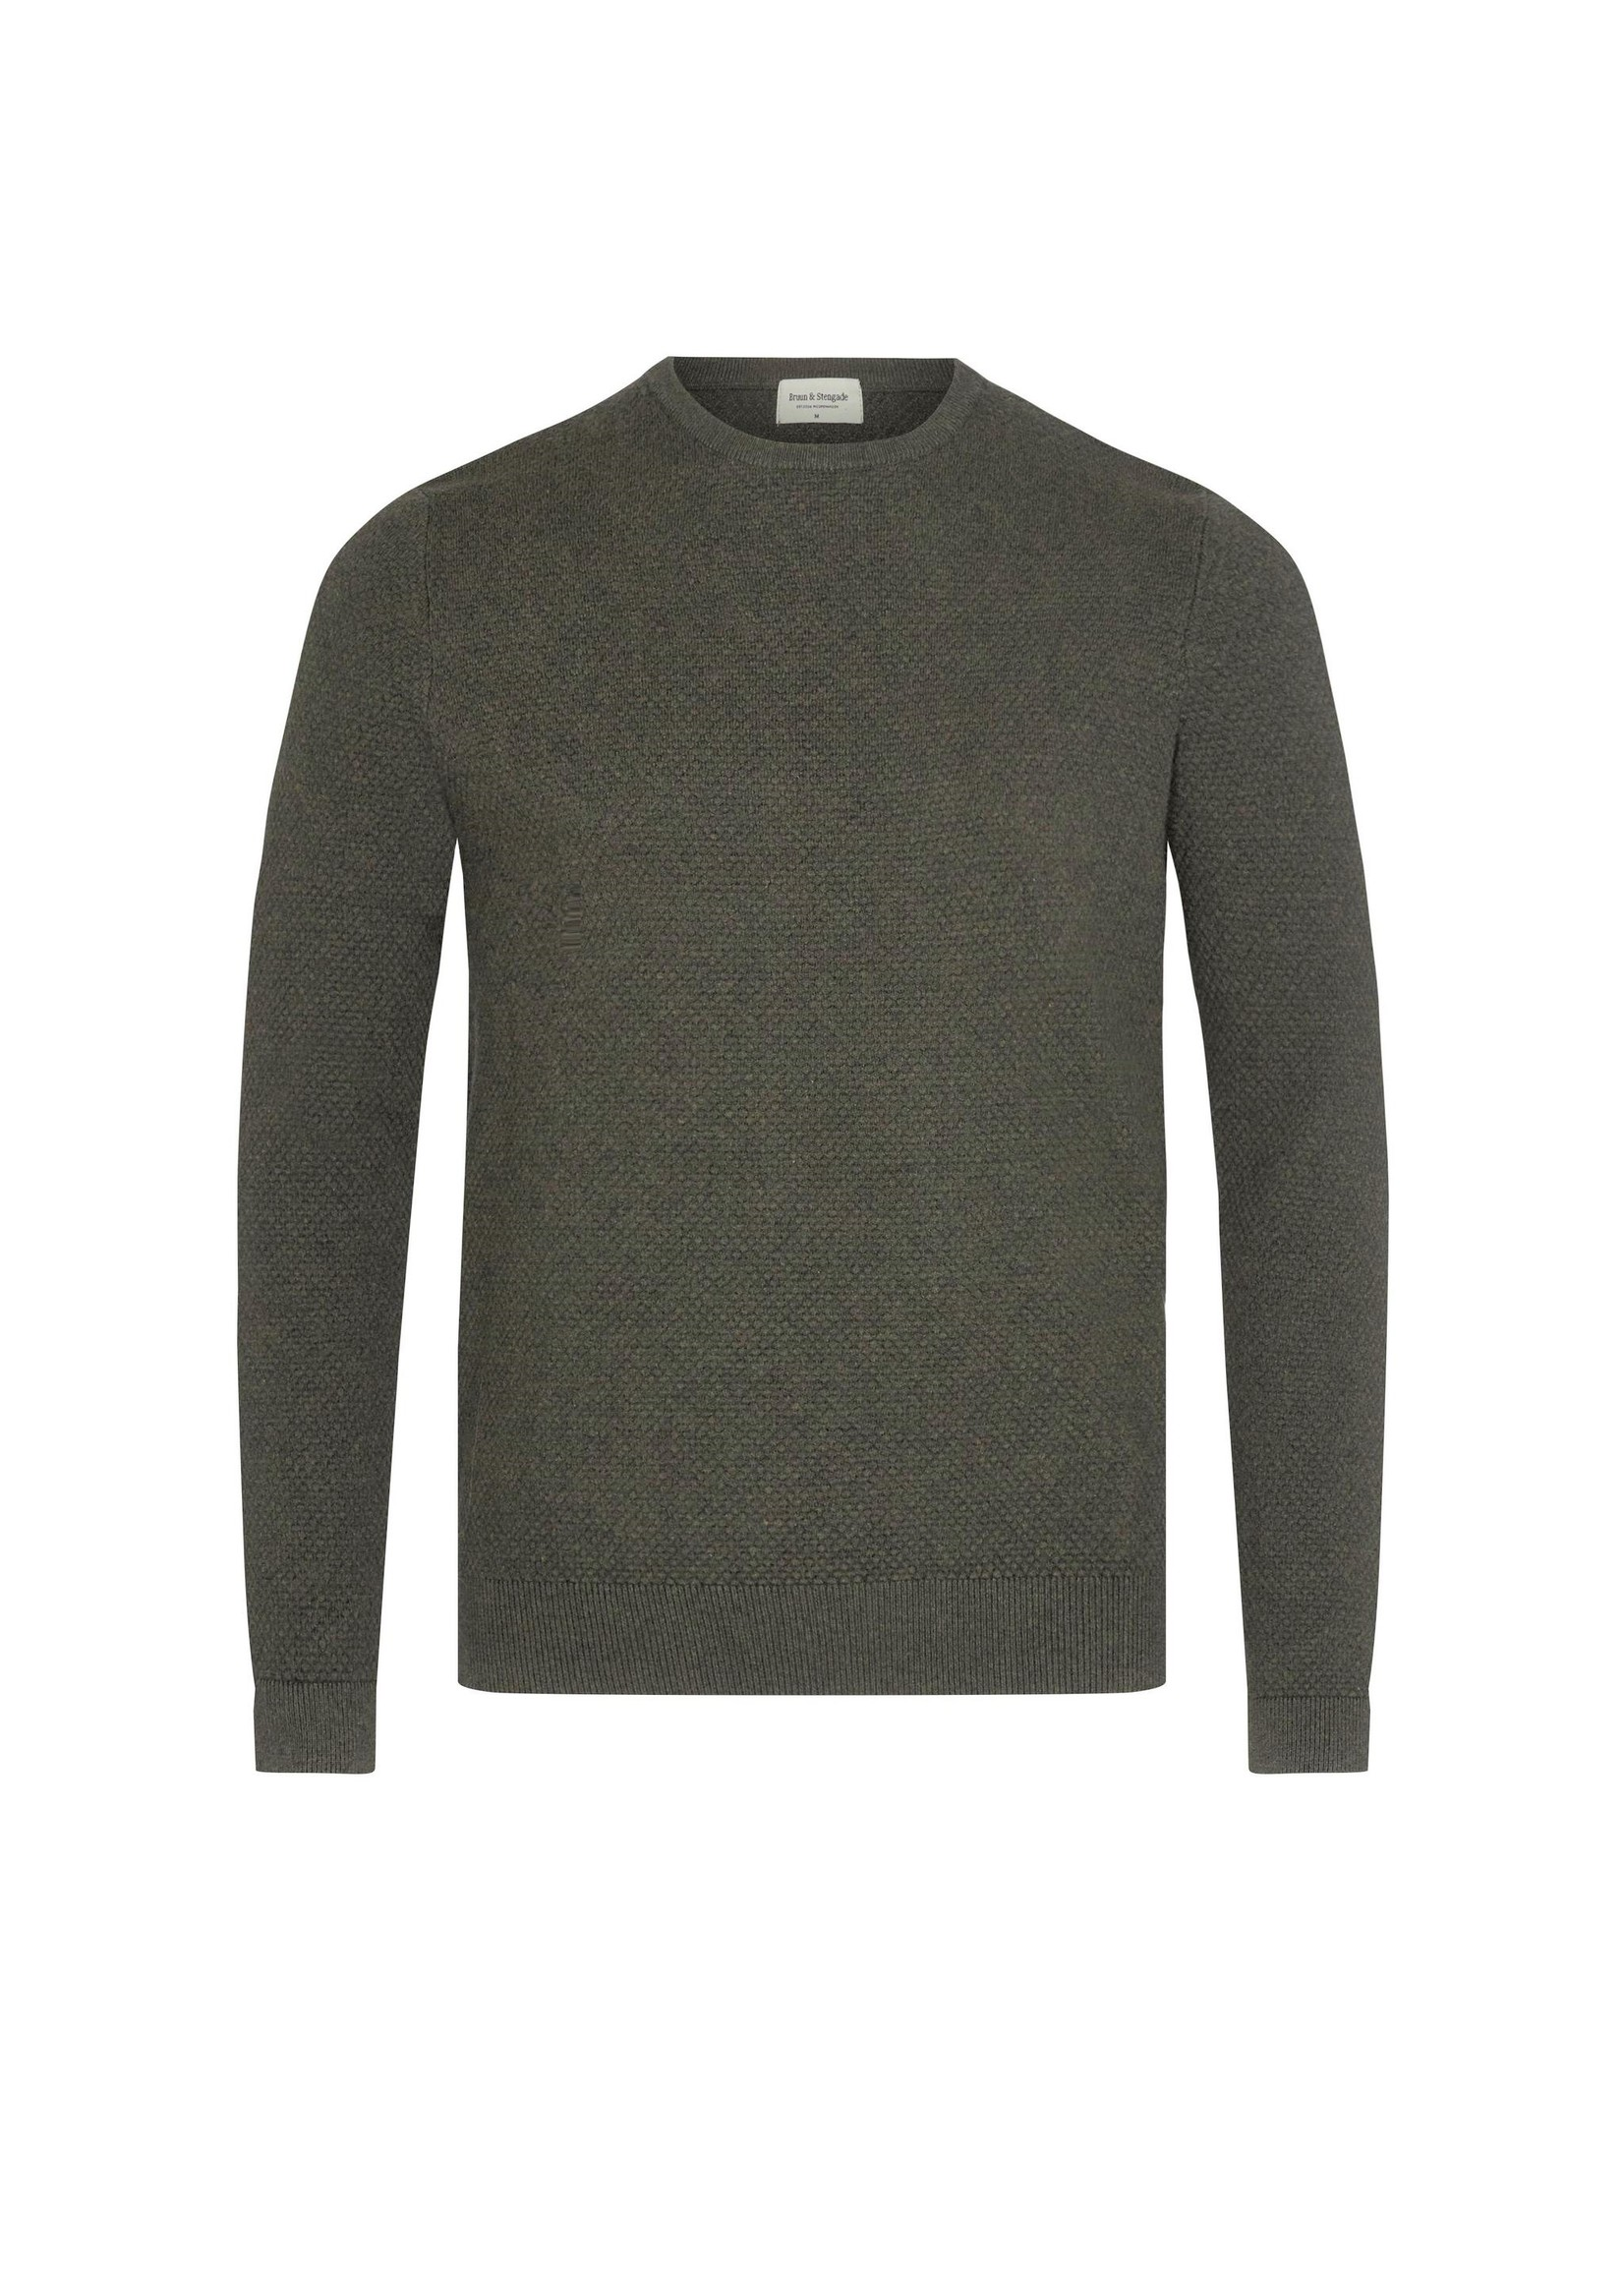 Bruun & Stengade Diamond Knit Crew Neck Sweater 2102-04002